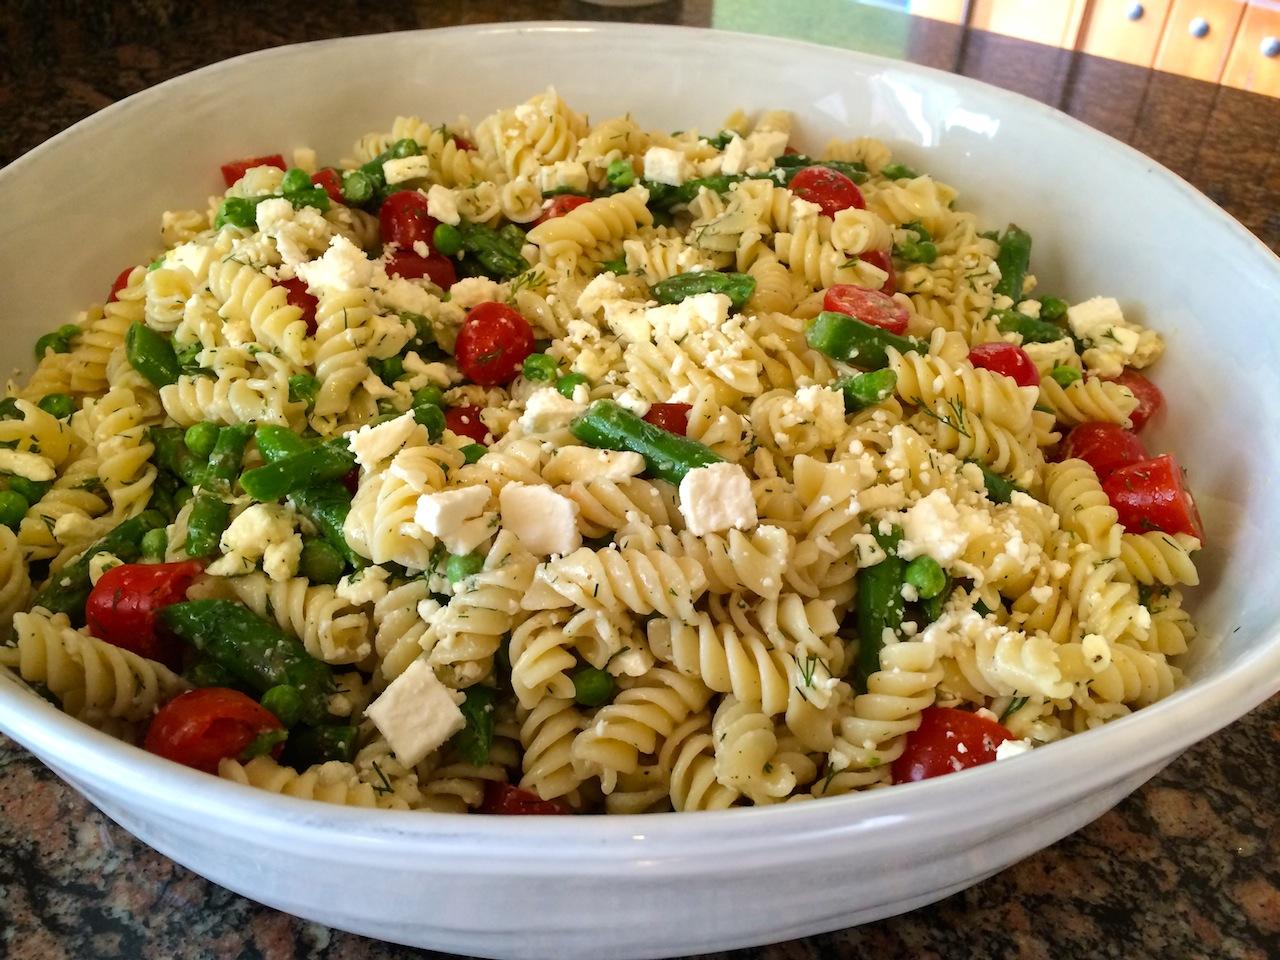 pasta salad recipe cold - 28 images - cold tuna macaroni